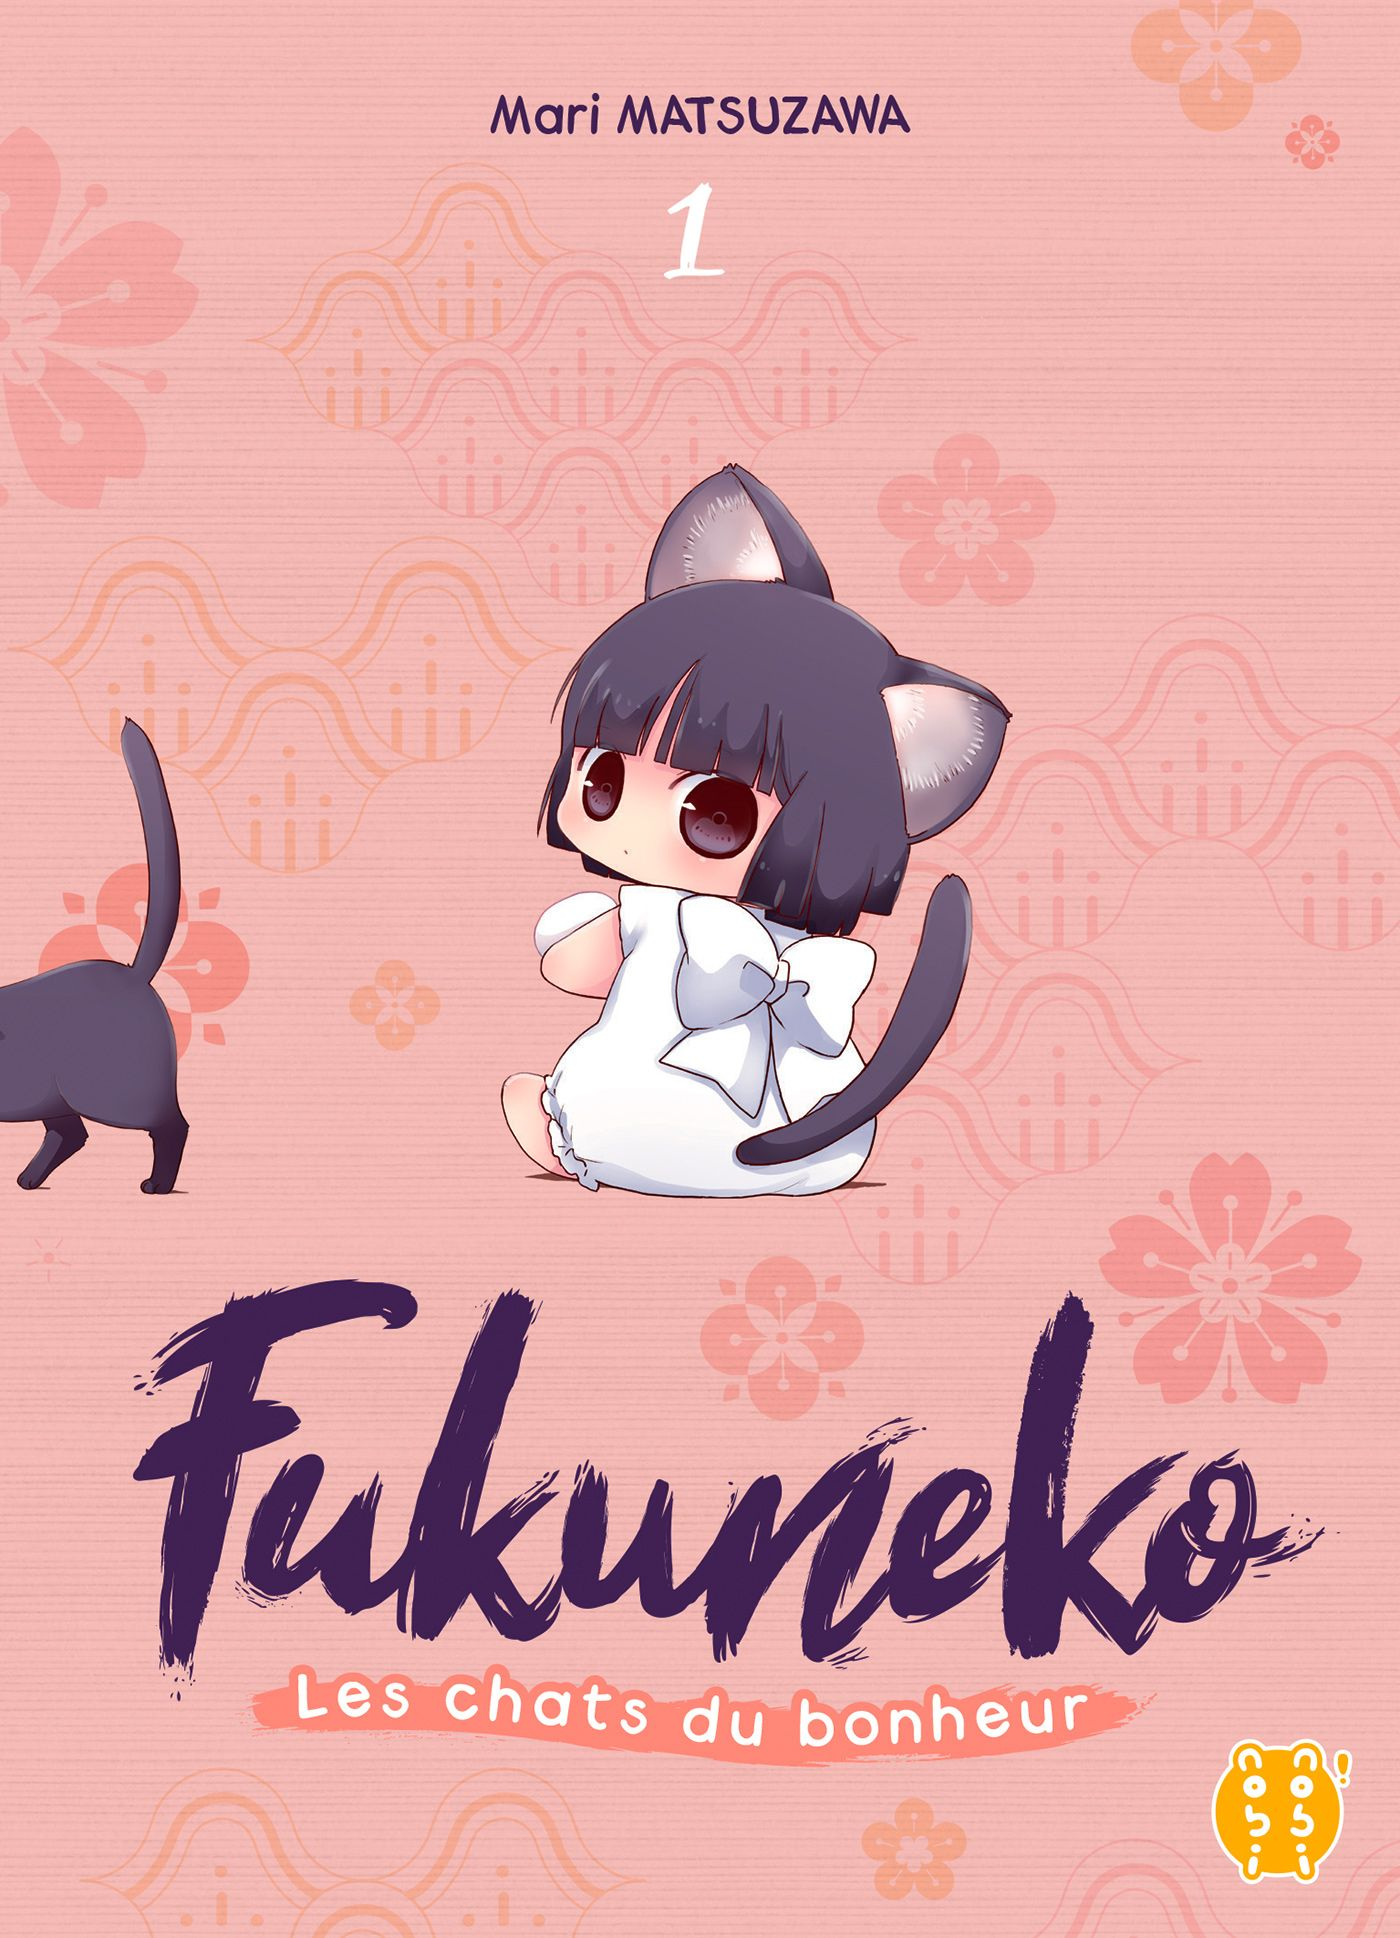 Sortie Manga au Québec JUILLET 2021 Fukuneko-1-nobi